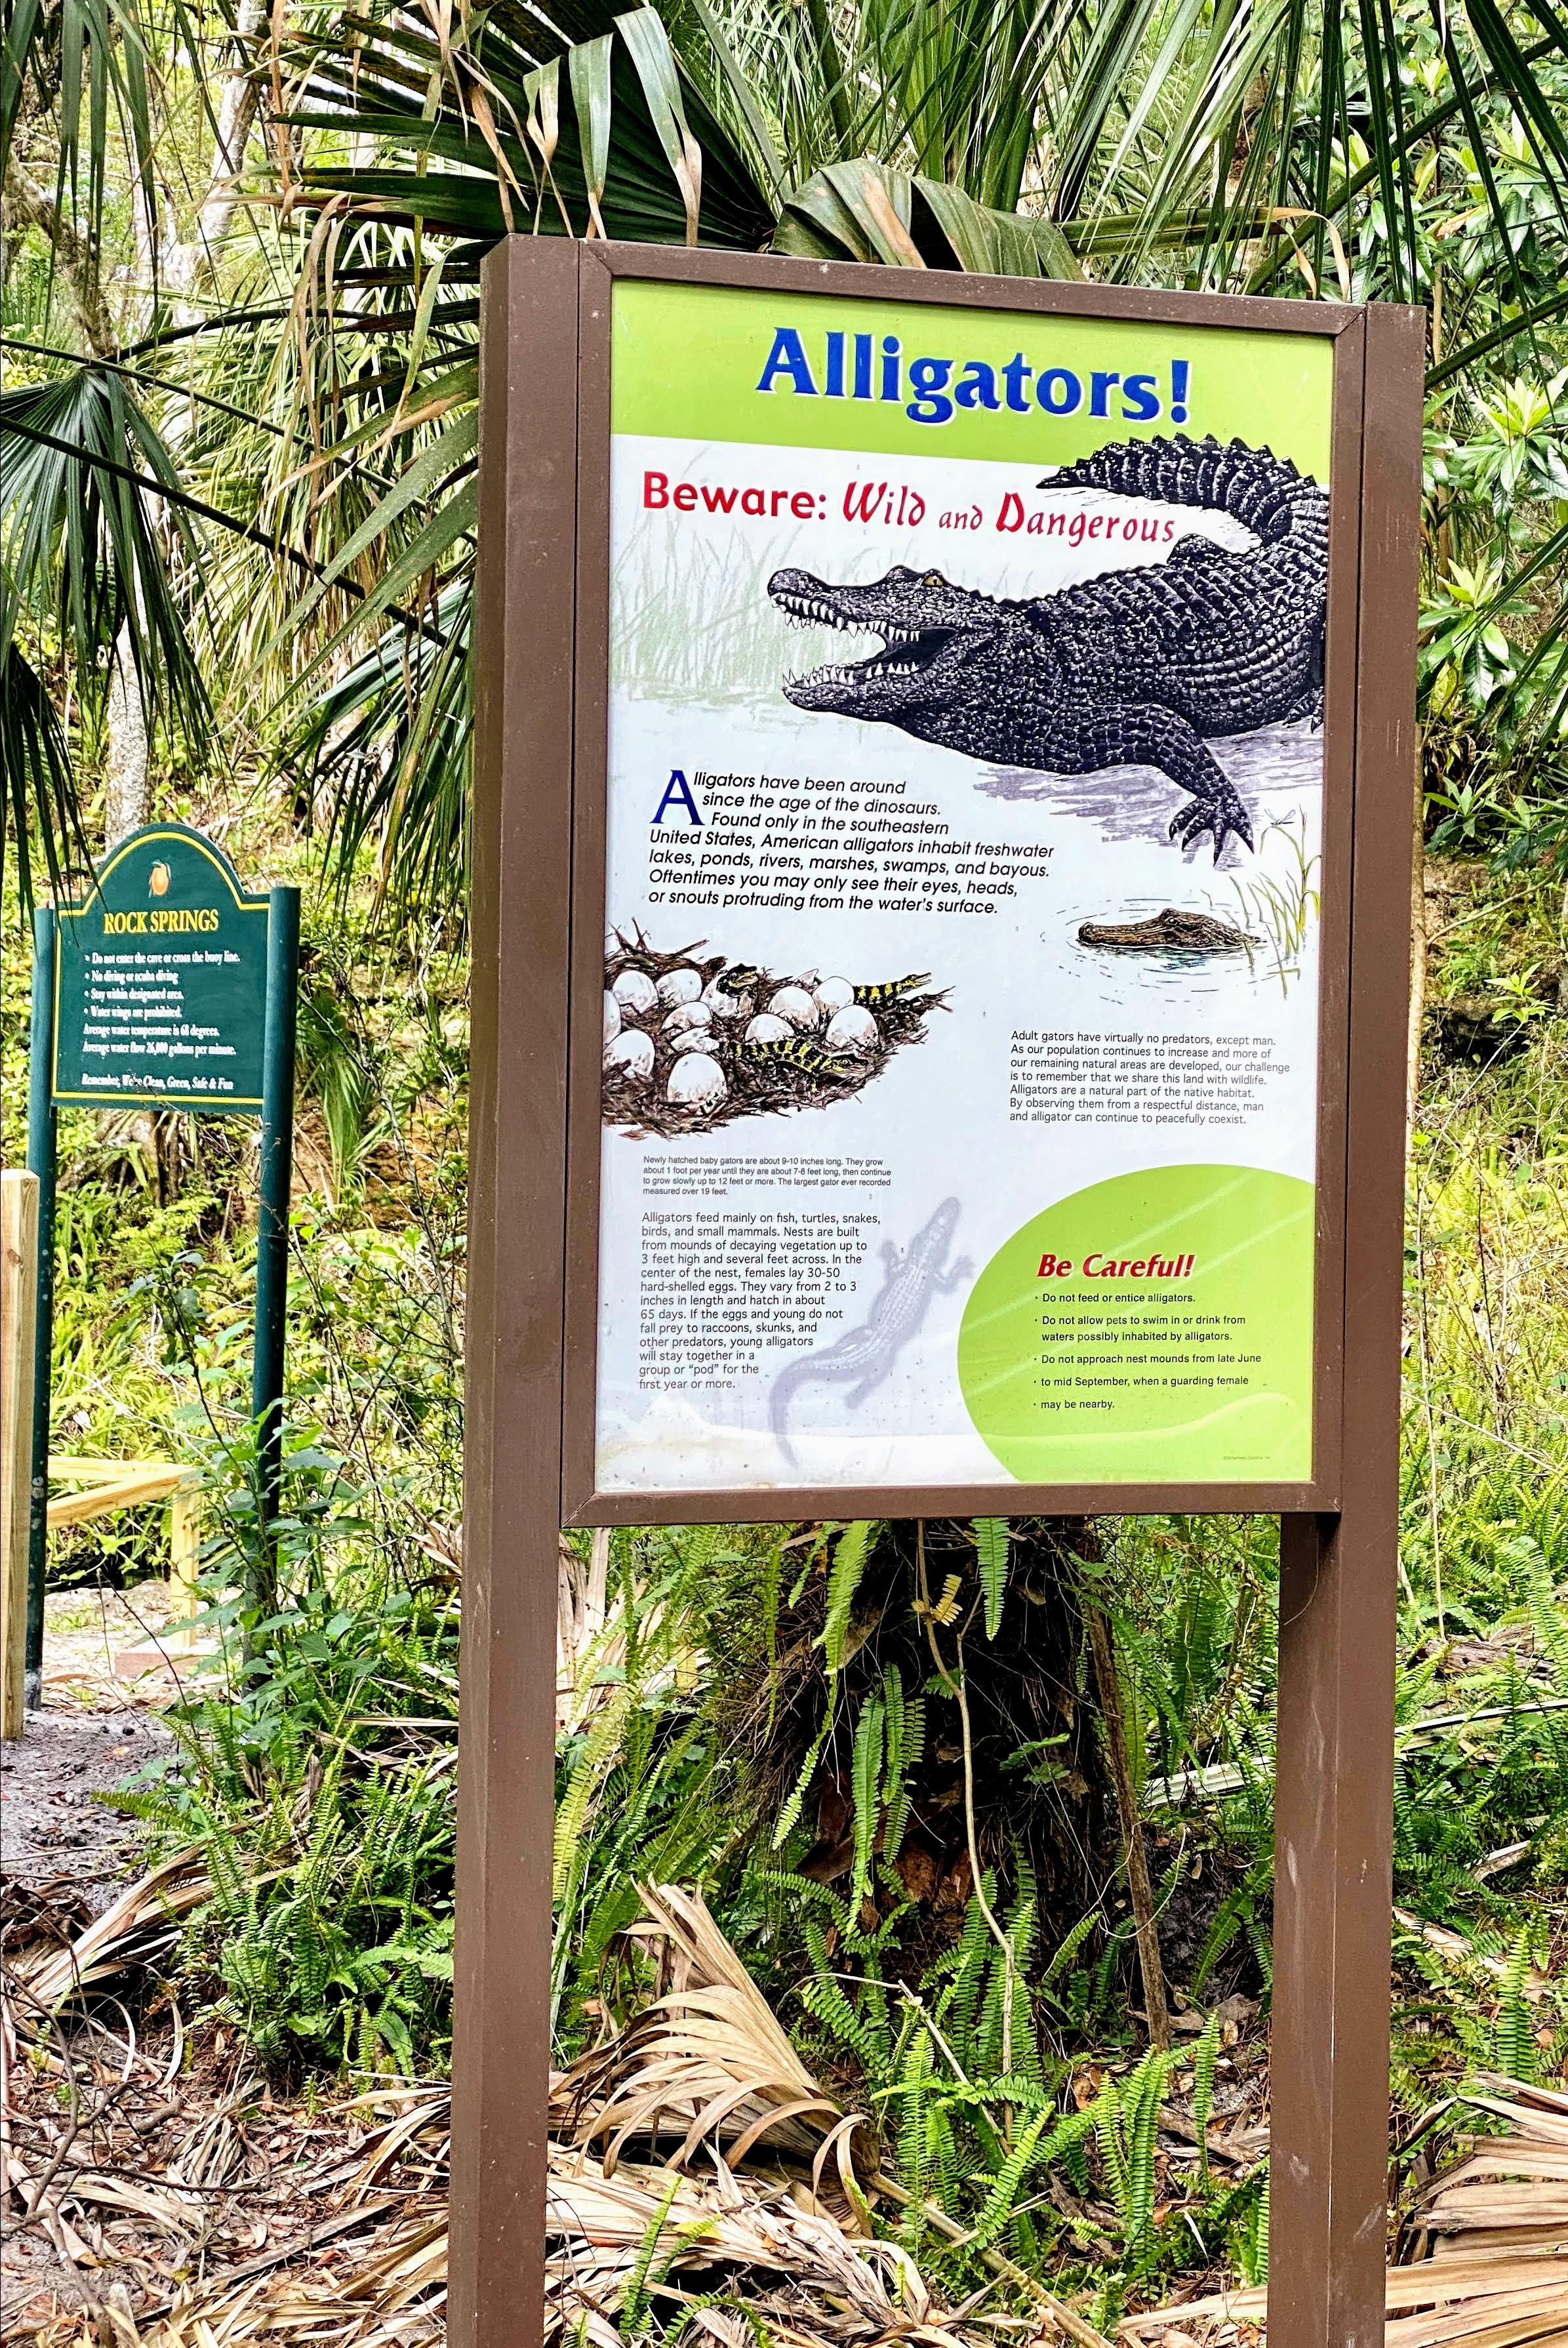 Alligator sign at Kelly Spring